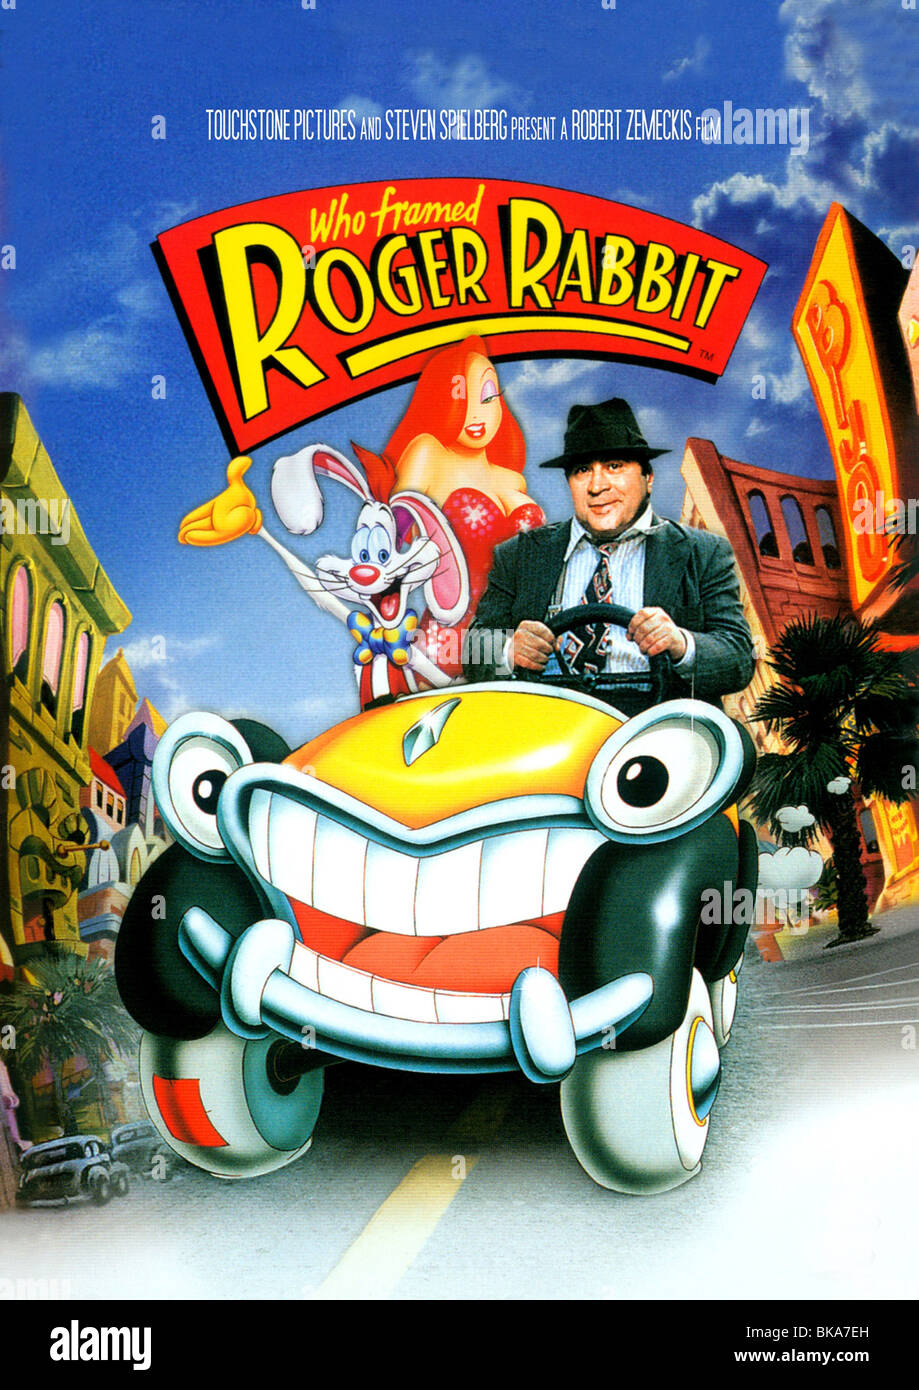 Wer Framed Roger Rabbit Jahr: 1988 - USA Regie: Robert Zemeckis Bob ...